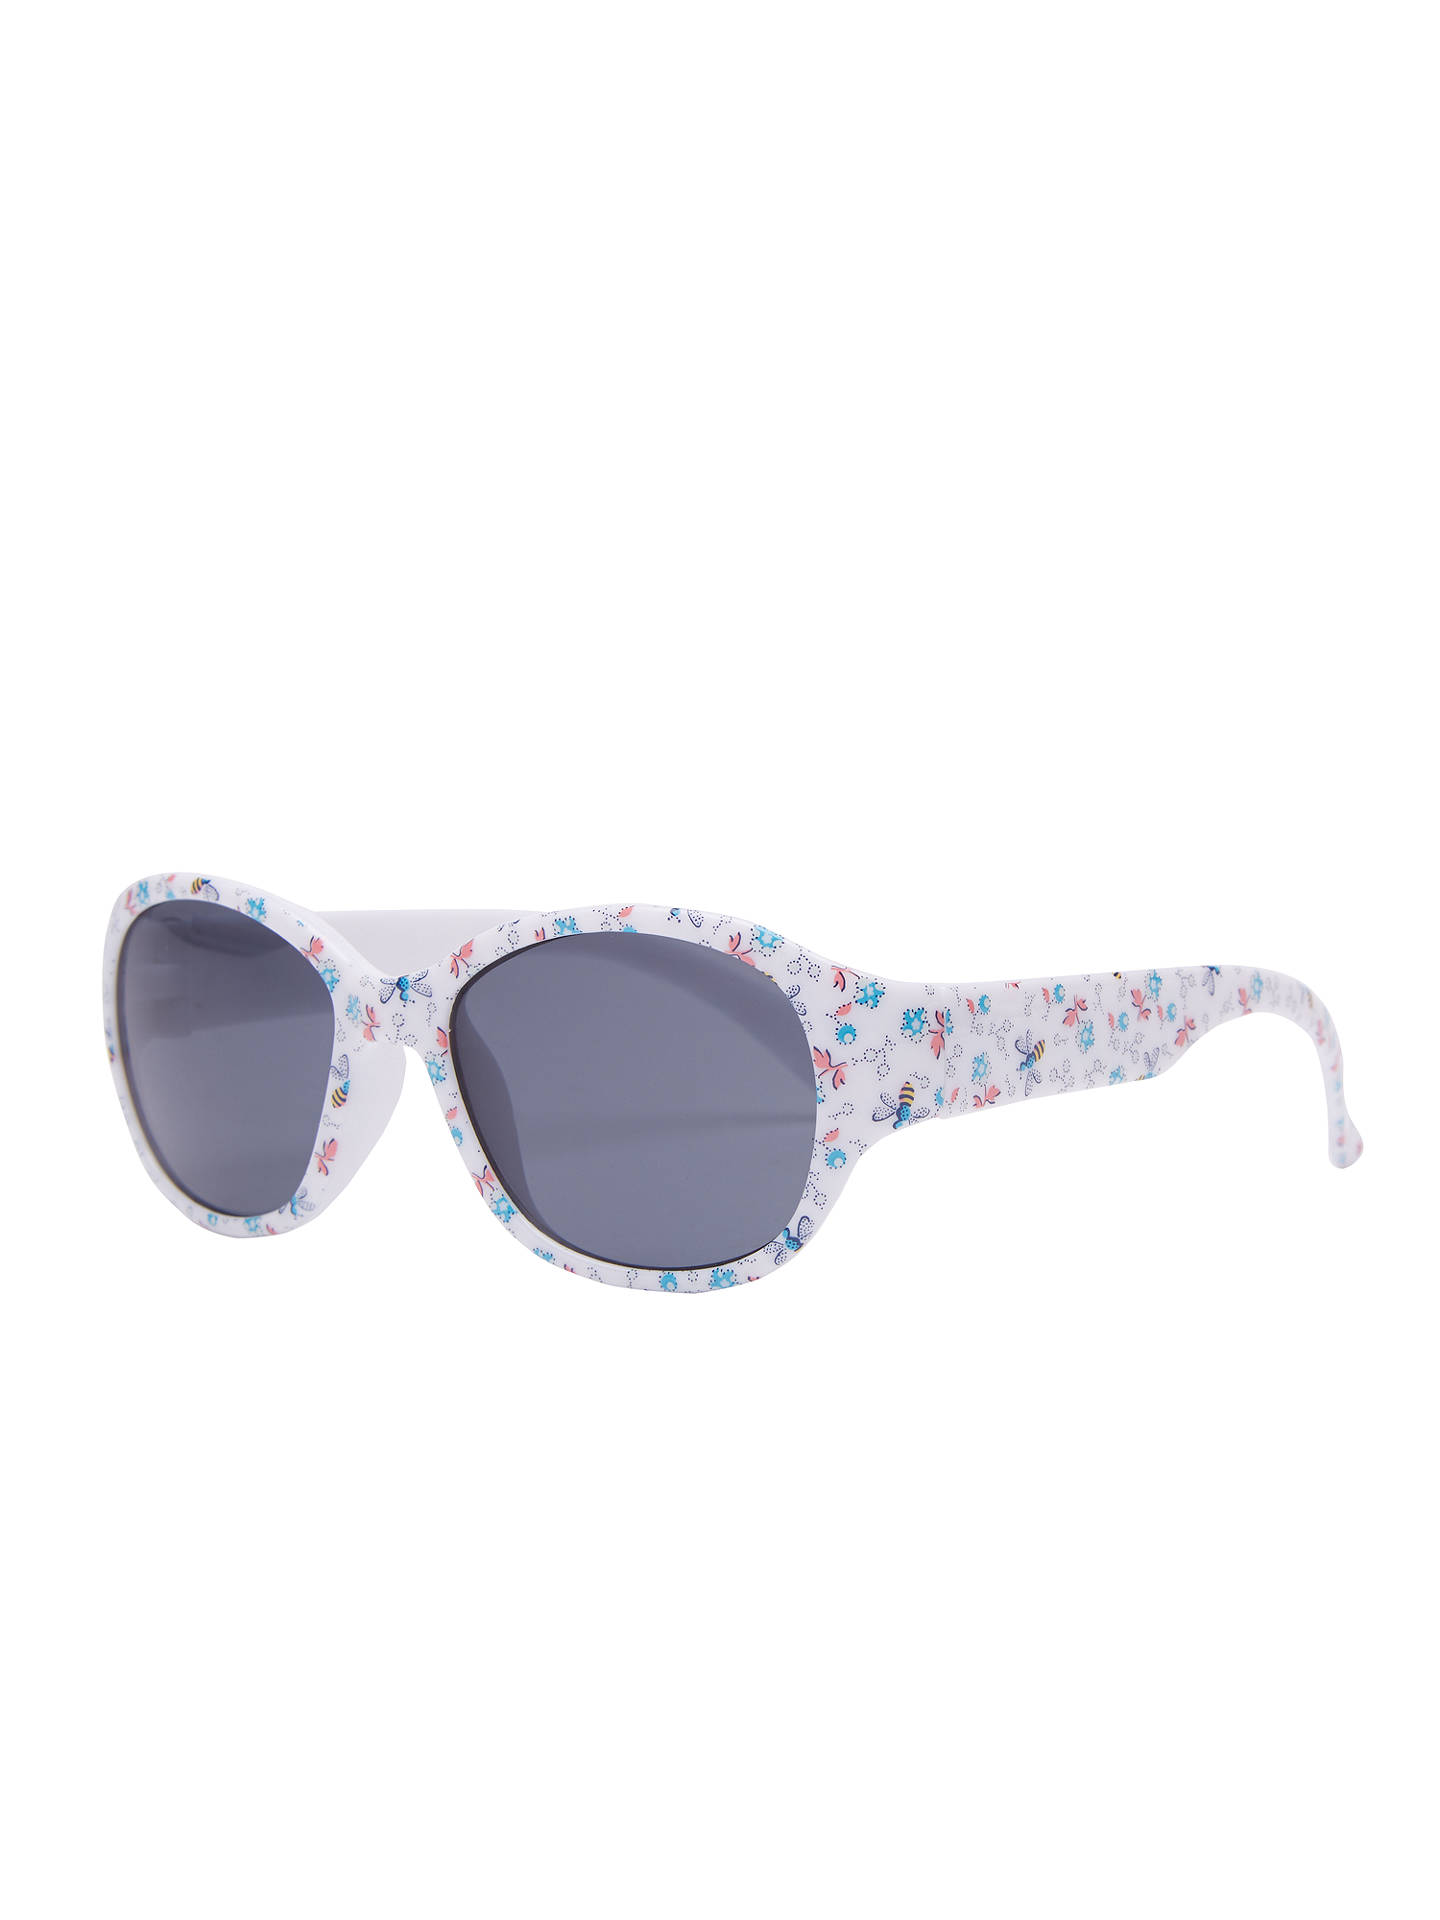 f35ba3dcc05a1 Buy John Lewis   Partners Girls  Floral Bee Sunglasses